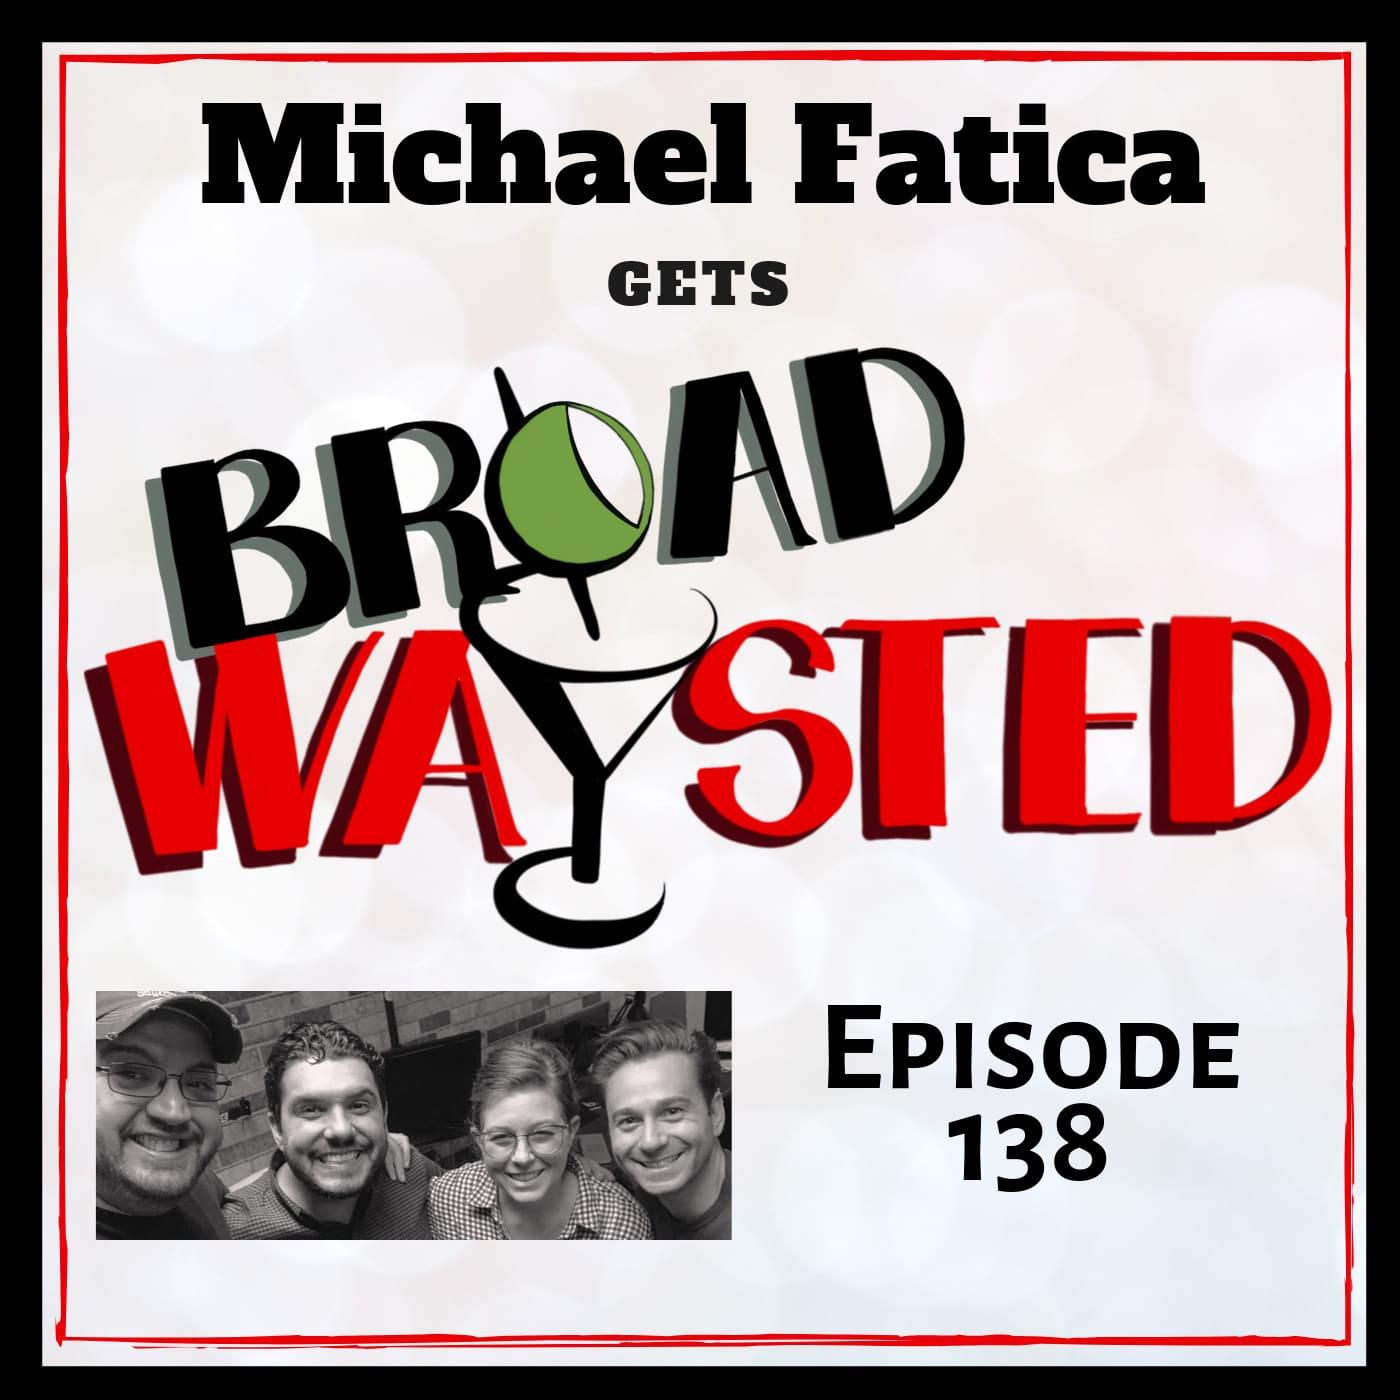 Broadwaysted Episode 138 Guest Michael Fatica